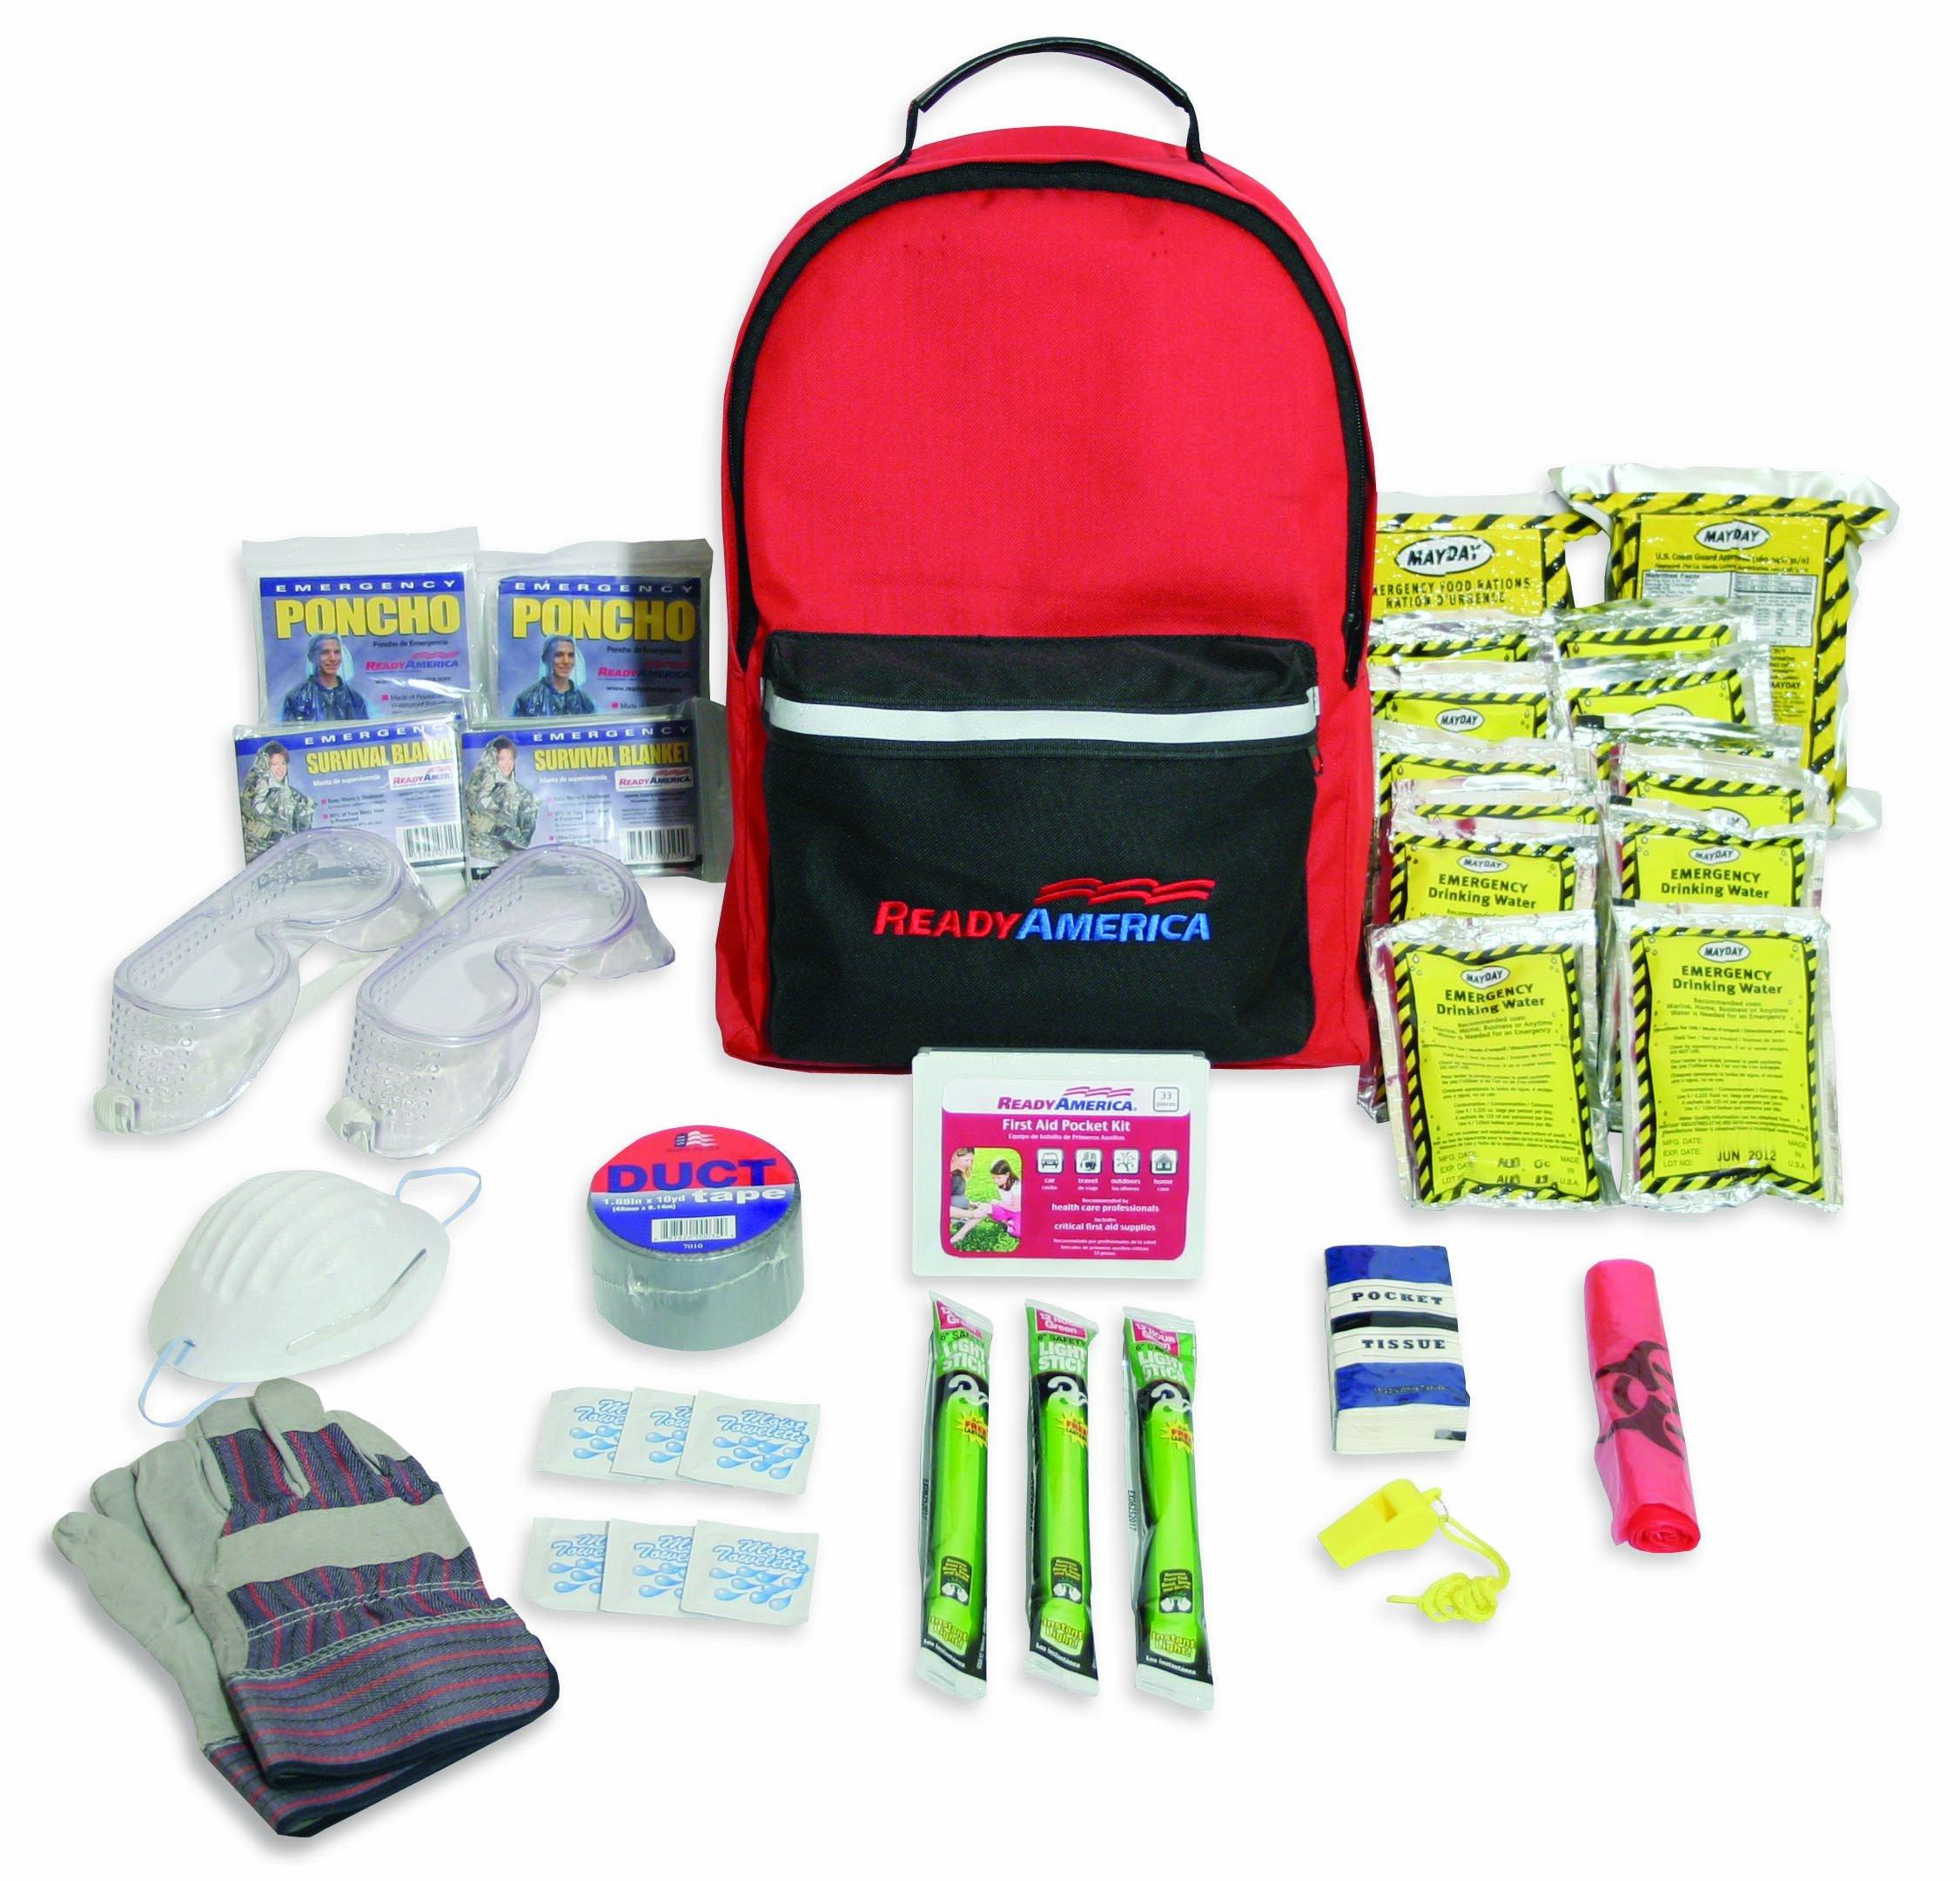 Ready America 70287 Tornado Emergency Kit for 2 Persons